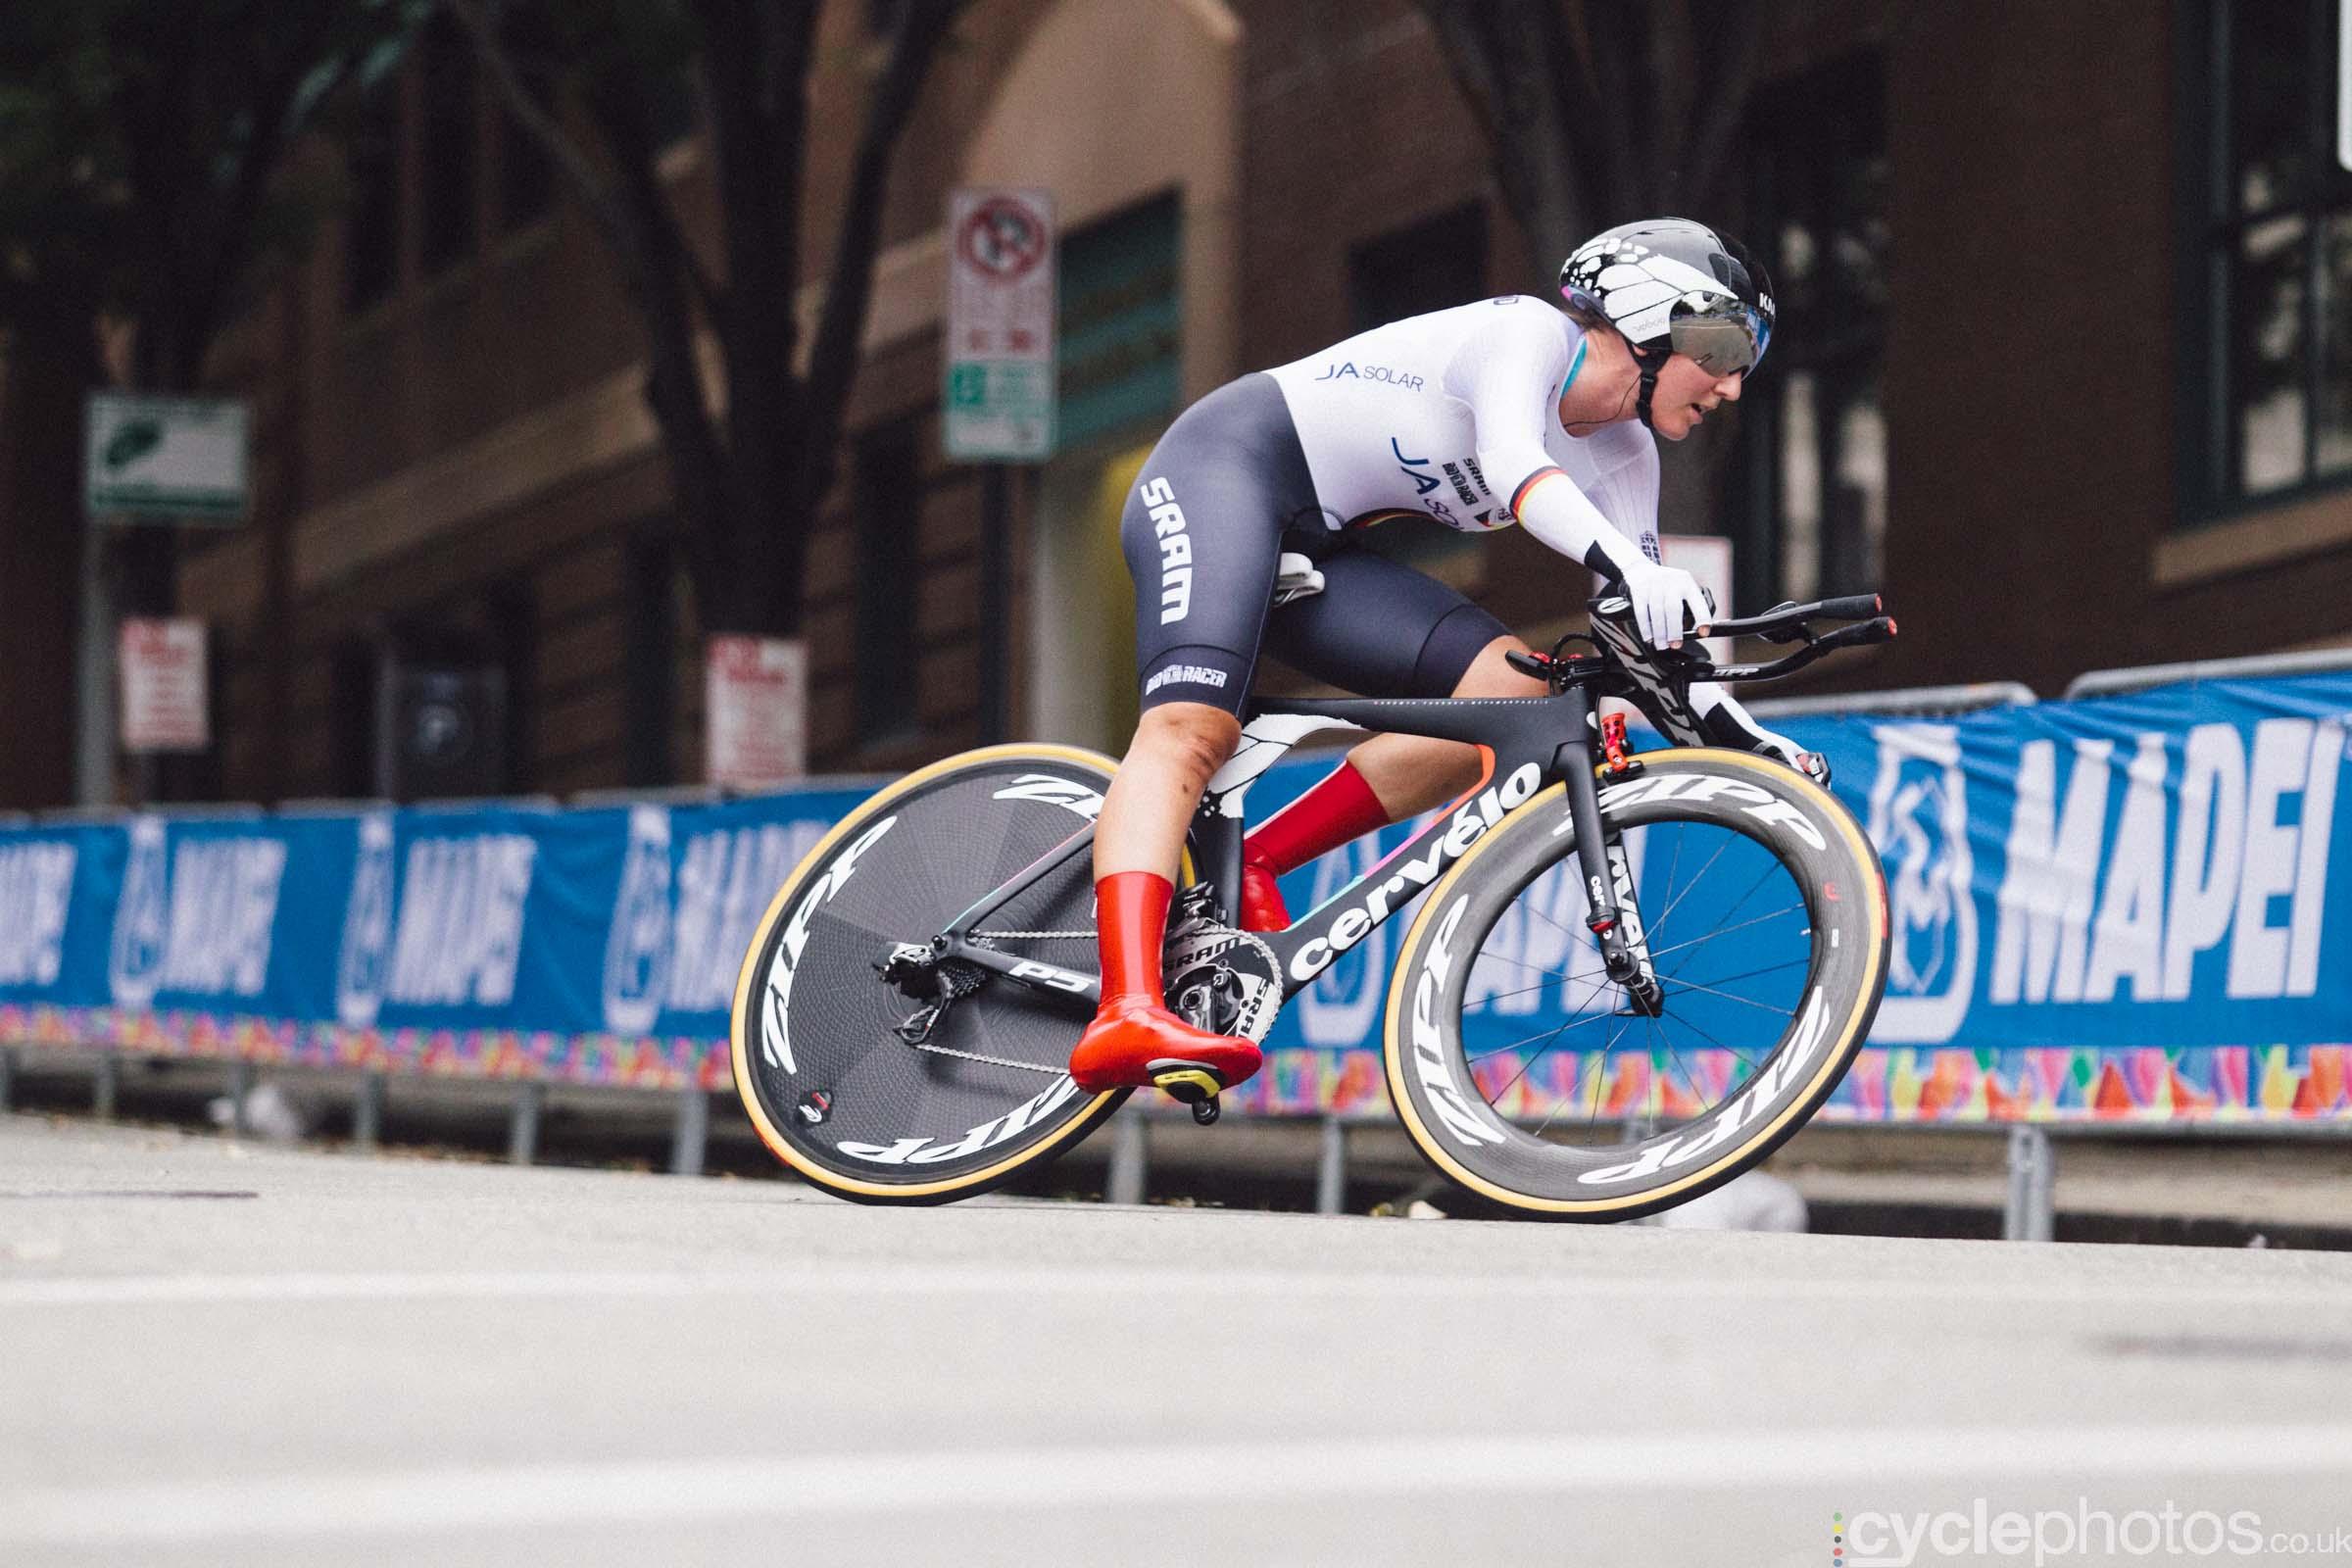 cyclephotos-world-champs-richmond-161823